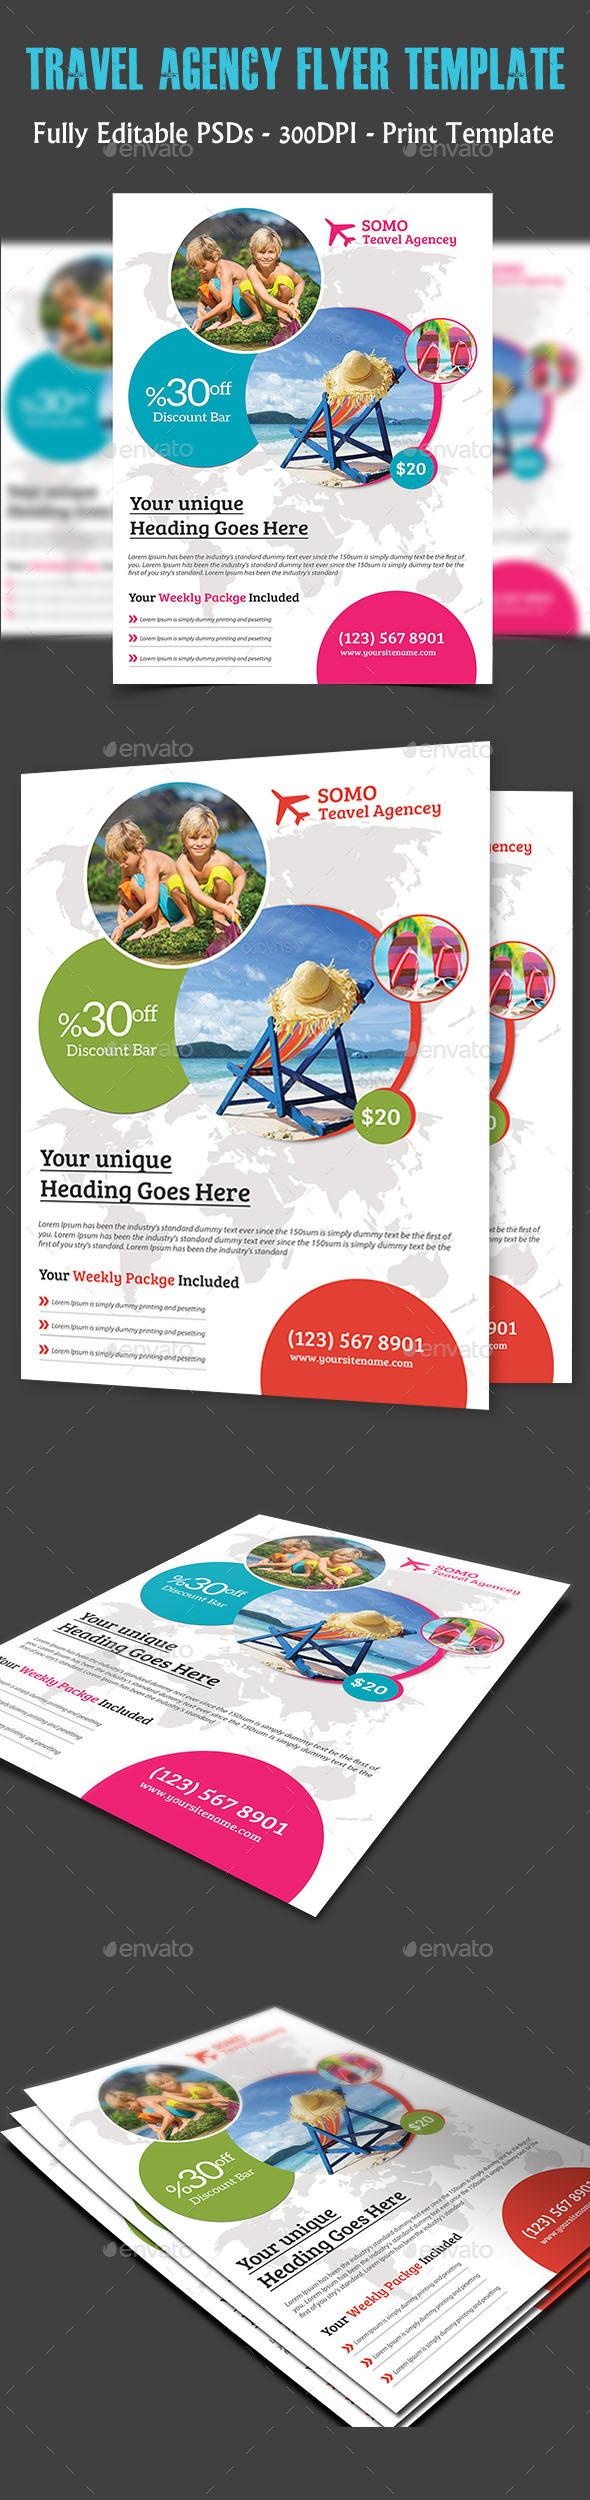 Travel Agency Flyer - Flyers Print Templates